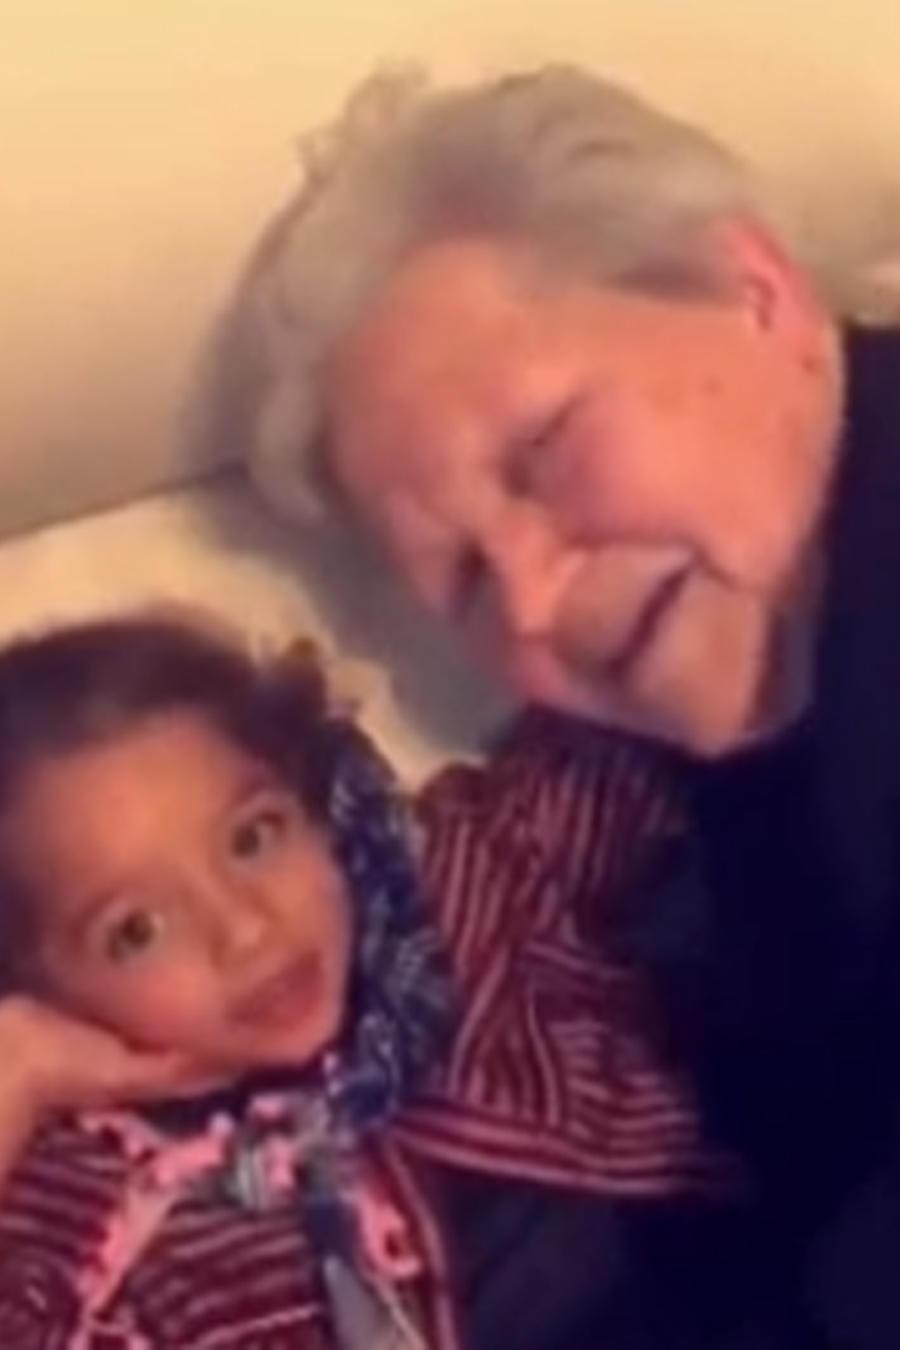 Alaïa con su bisabuela